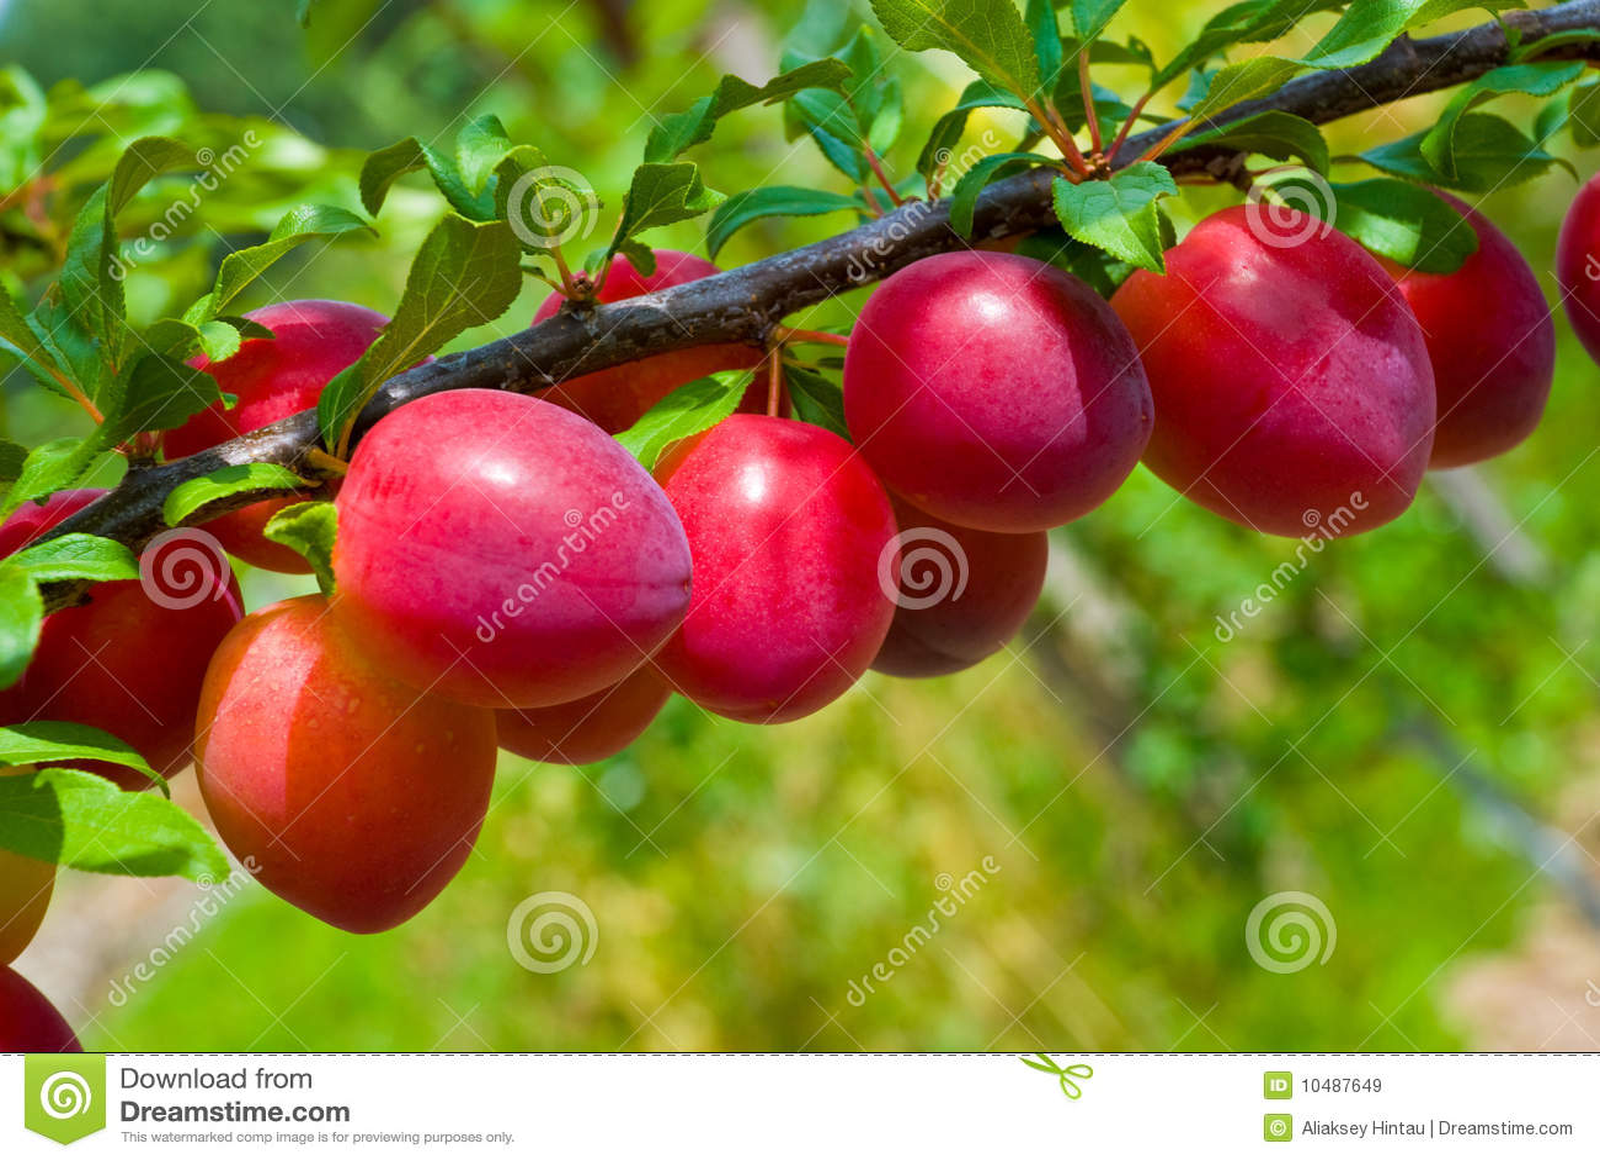 Frutas da árvore de ameixa